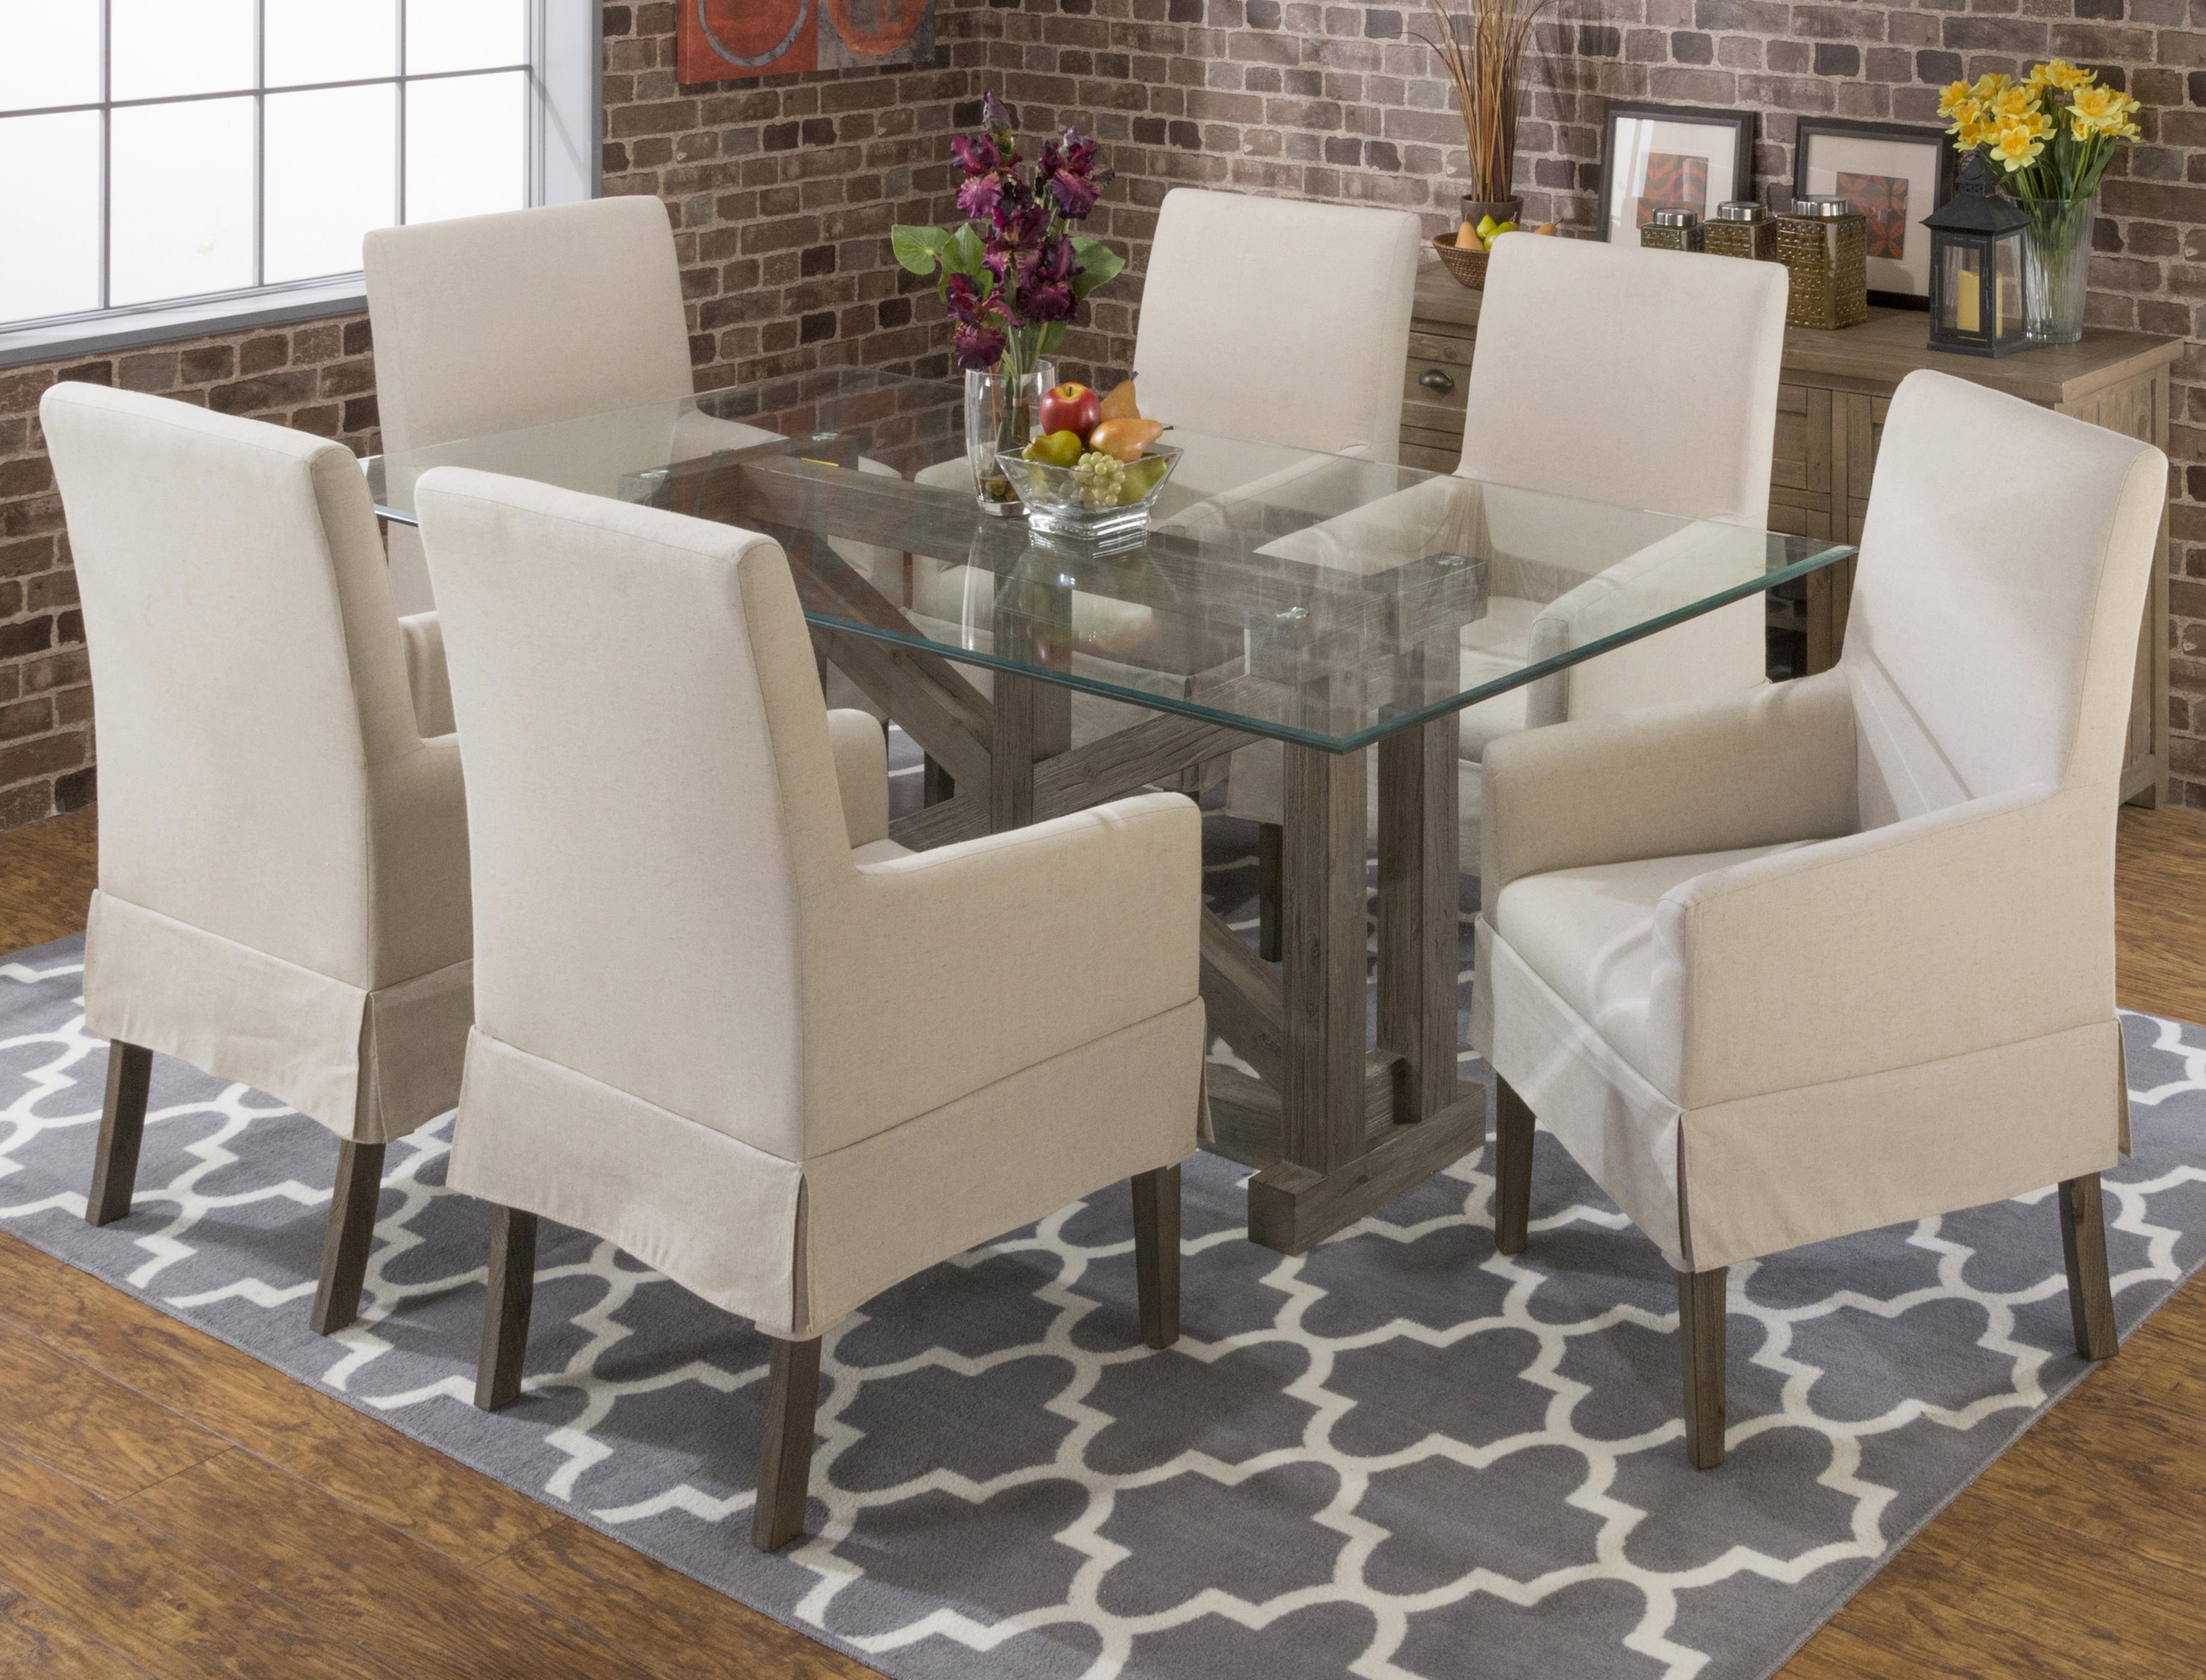 Jofran Hampton Sandblasted Table and Chair Set - Item Number: 872-78B-78G+6x147KD